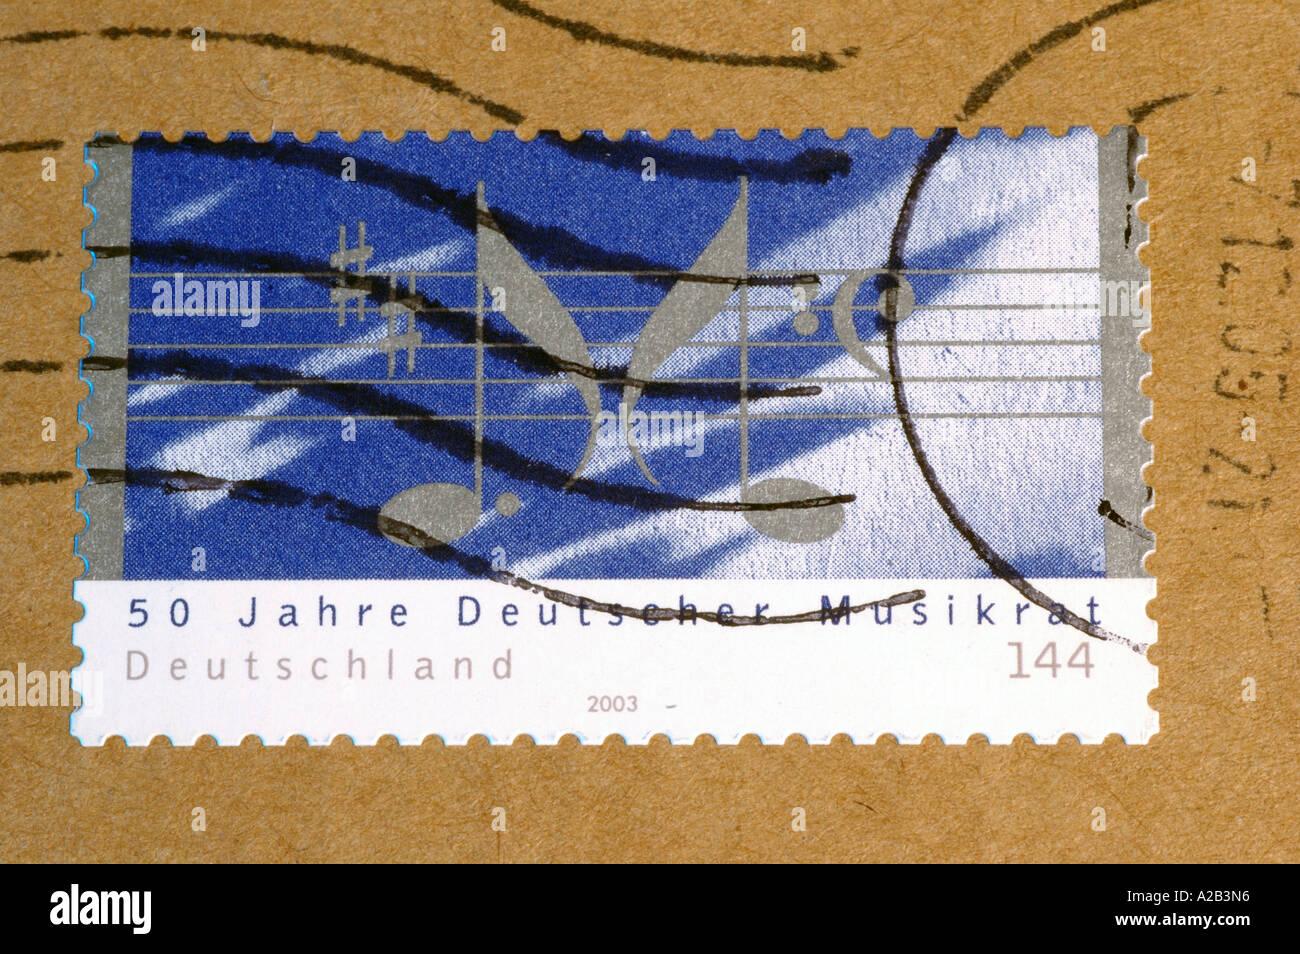 Canceled stamp - Stock Image